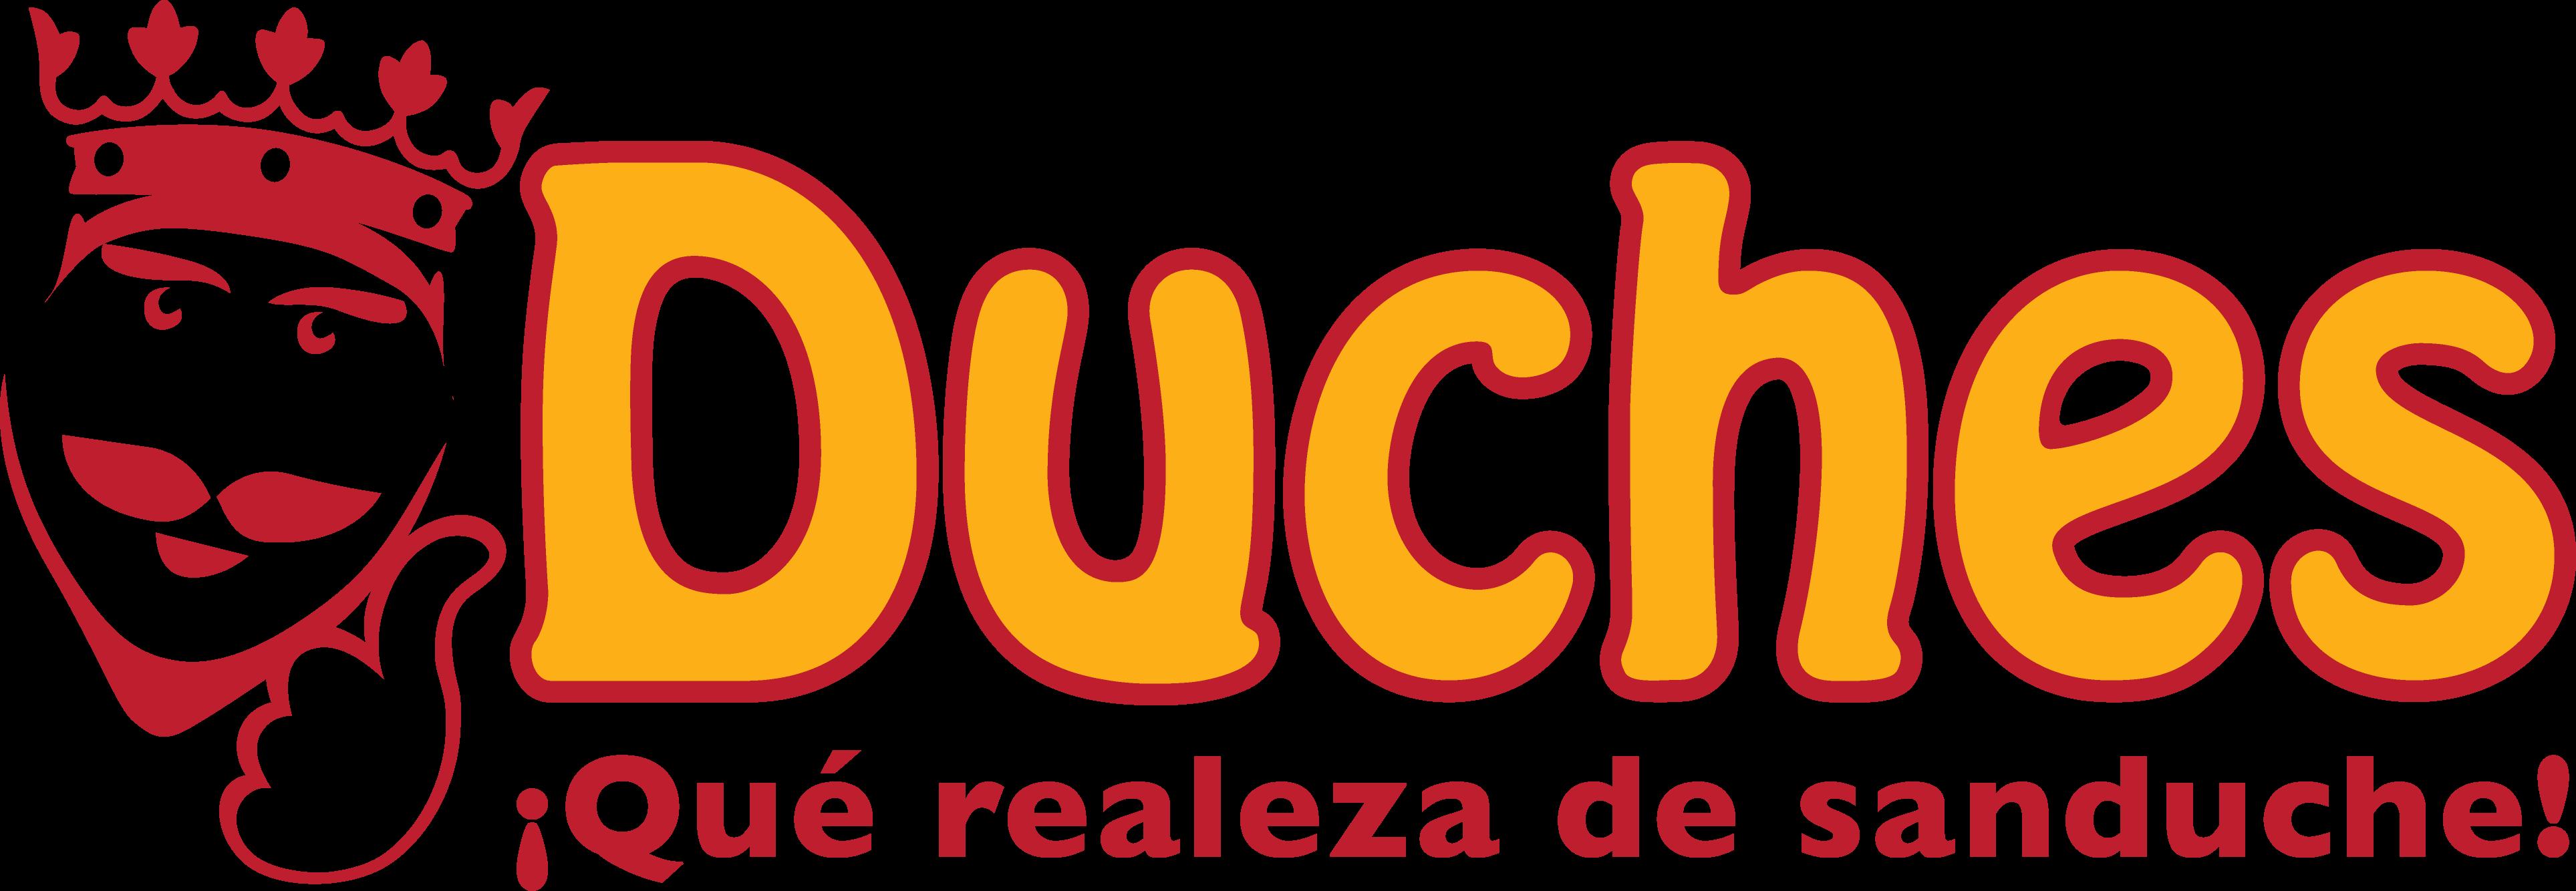 Duches